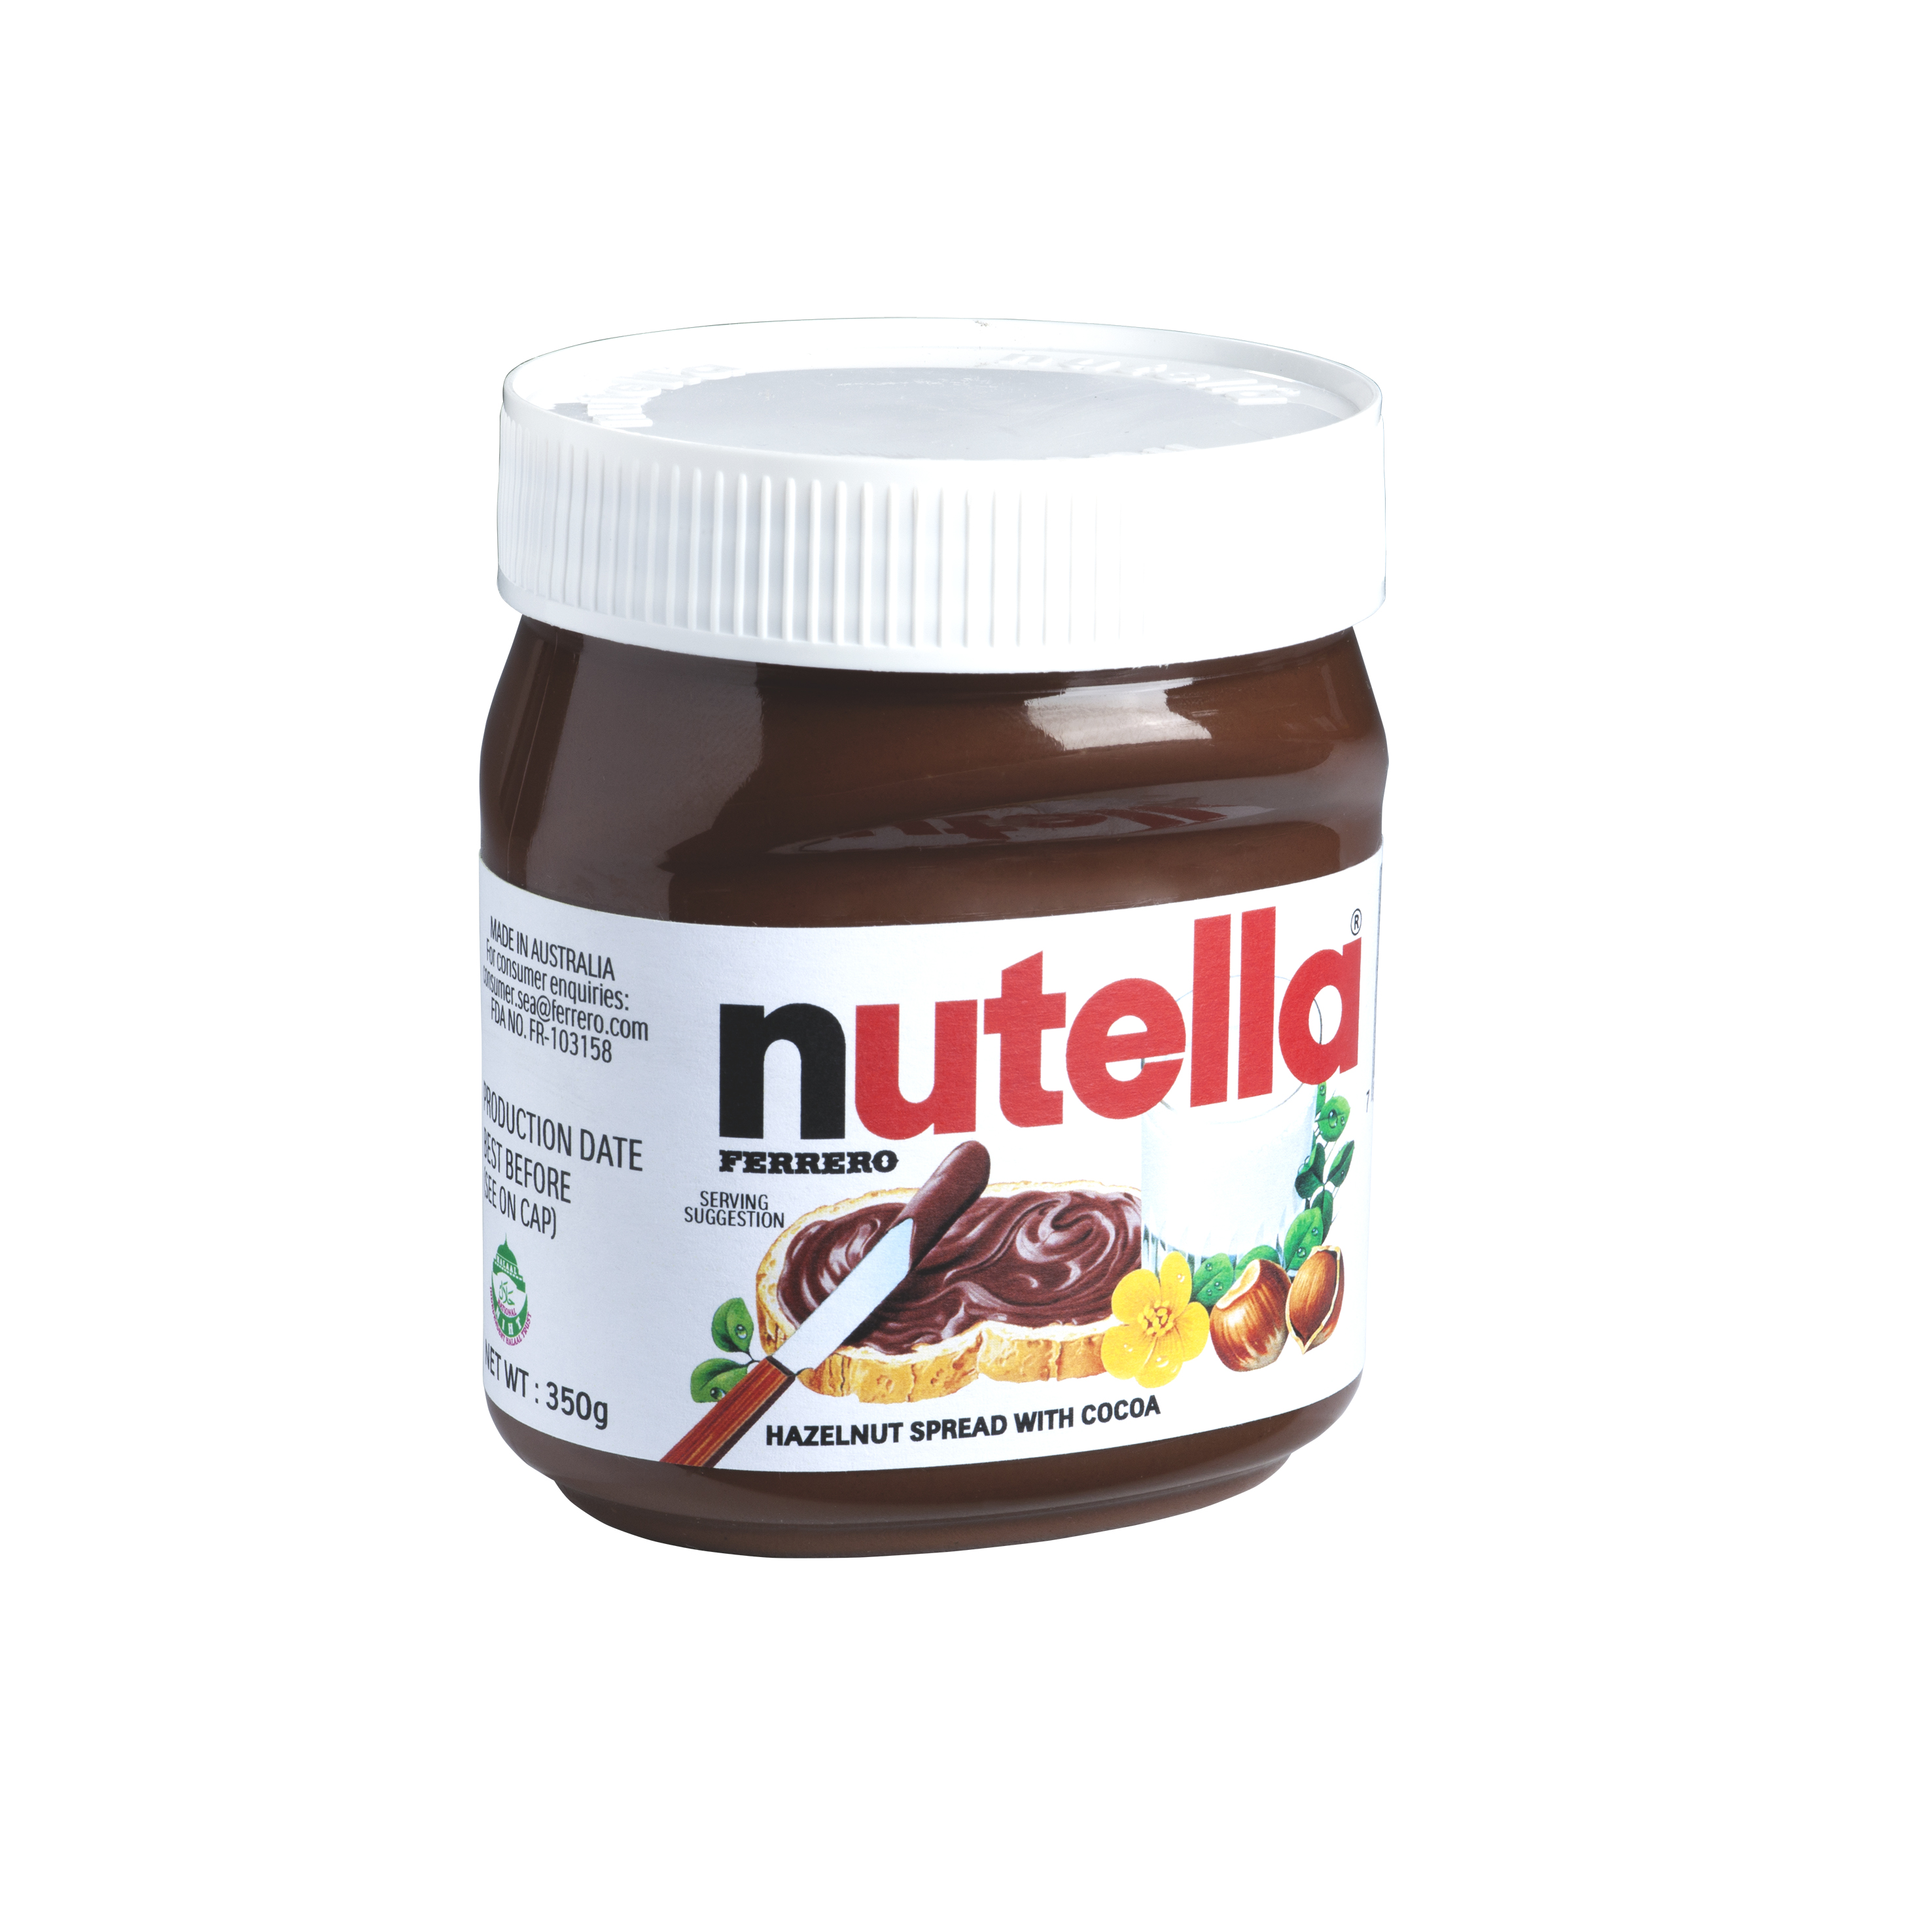 Nutella Hazelnut Spread T350 Jar 350gm 12 Jars Per Carton Sambal Cuk Travel Pack Bawang Imported From Australia Gba Pcode Fr114 Horeca Suppliers Supplybunny